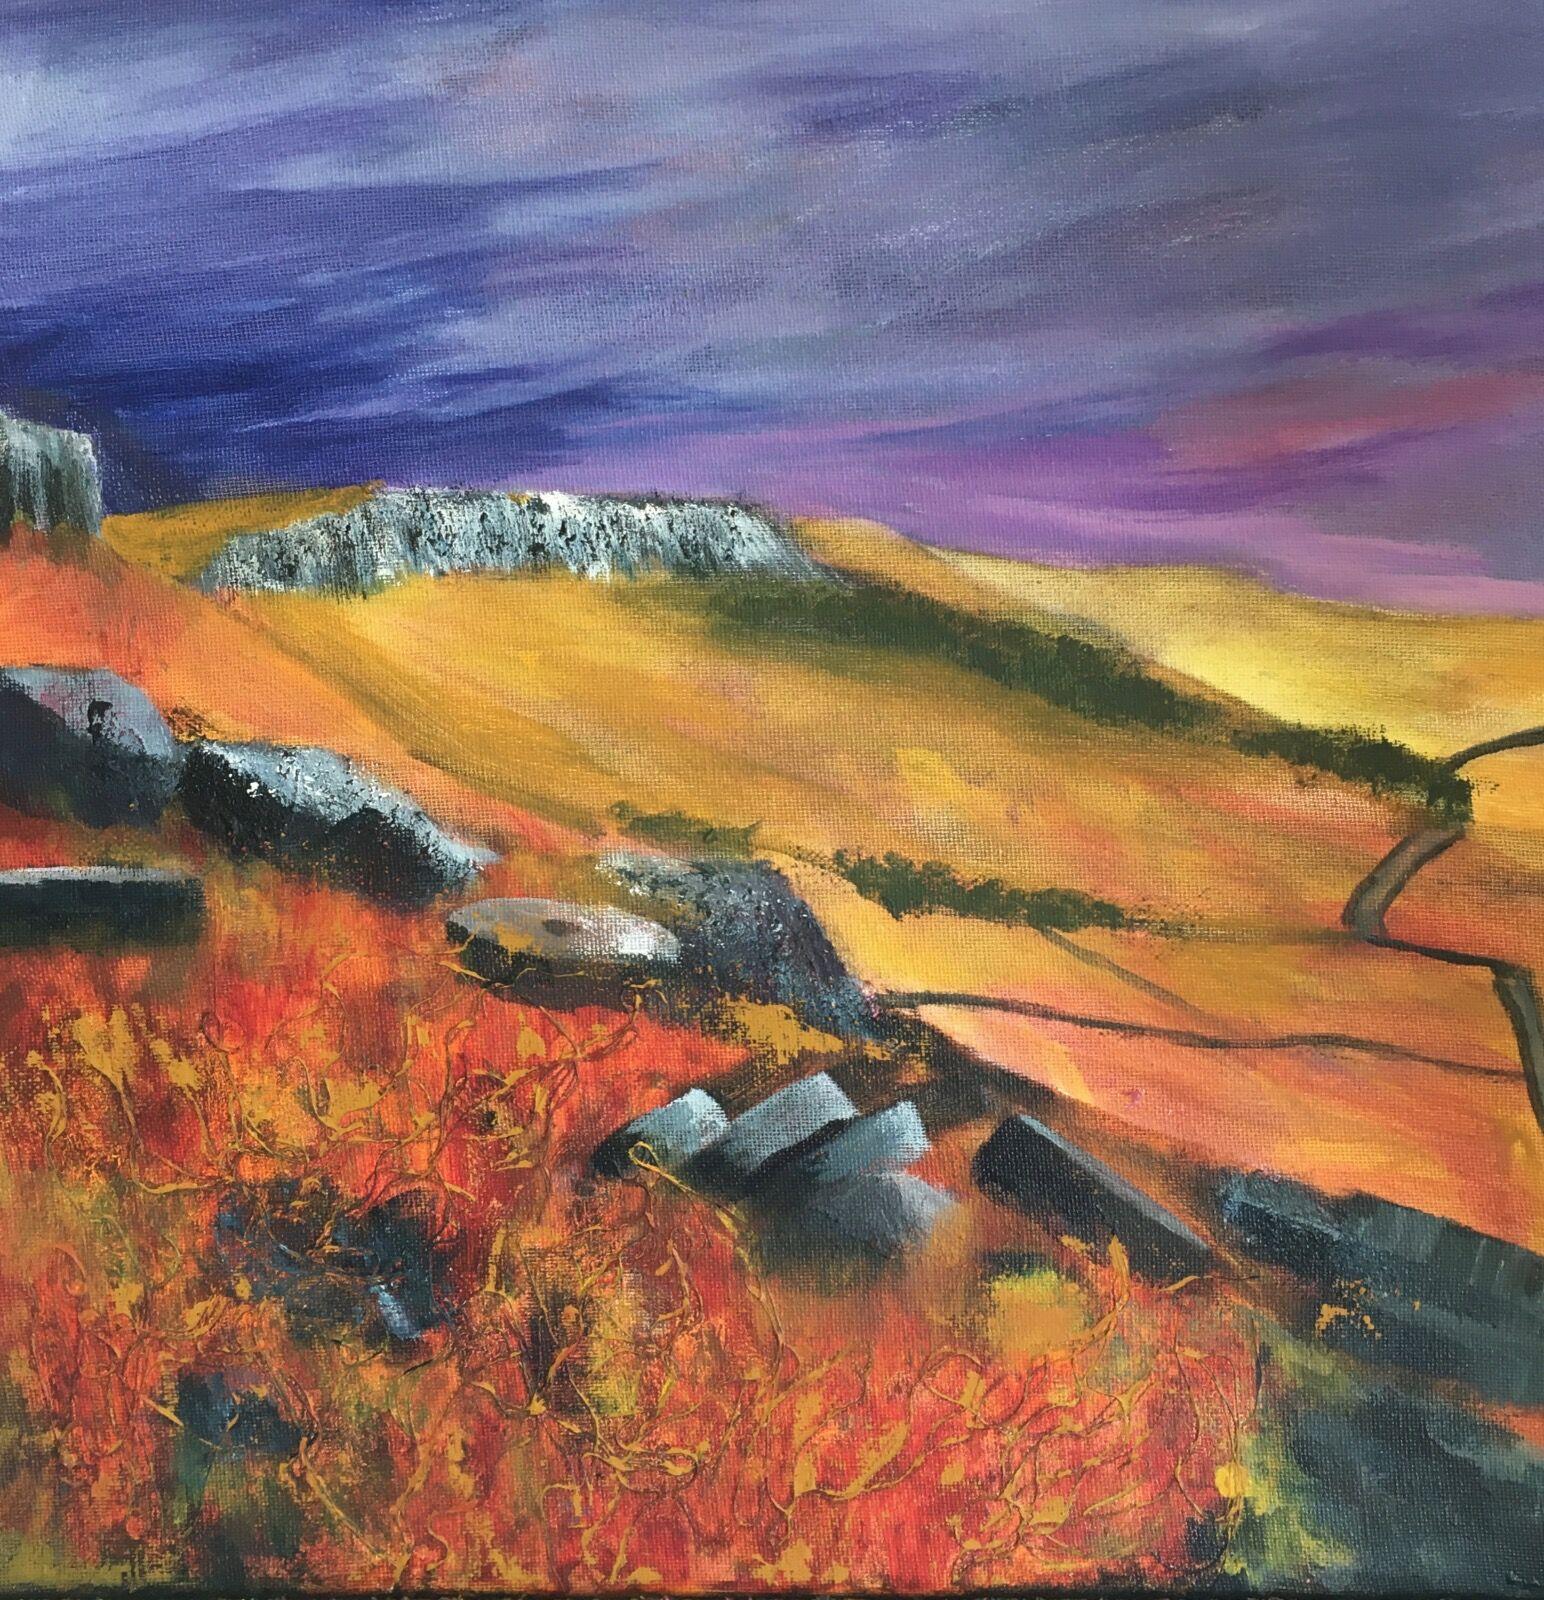 Millstones on Stanage Edge Peak District